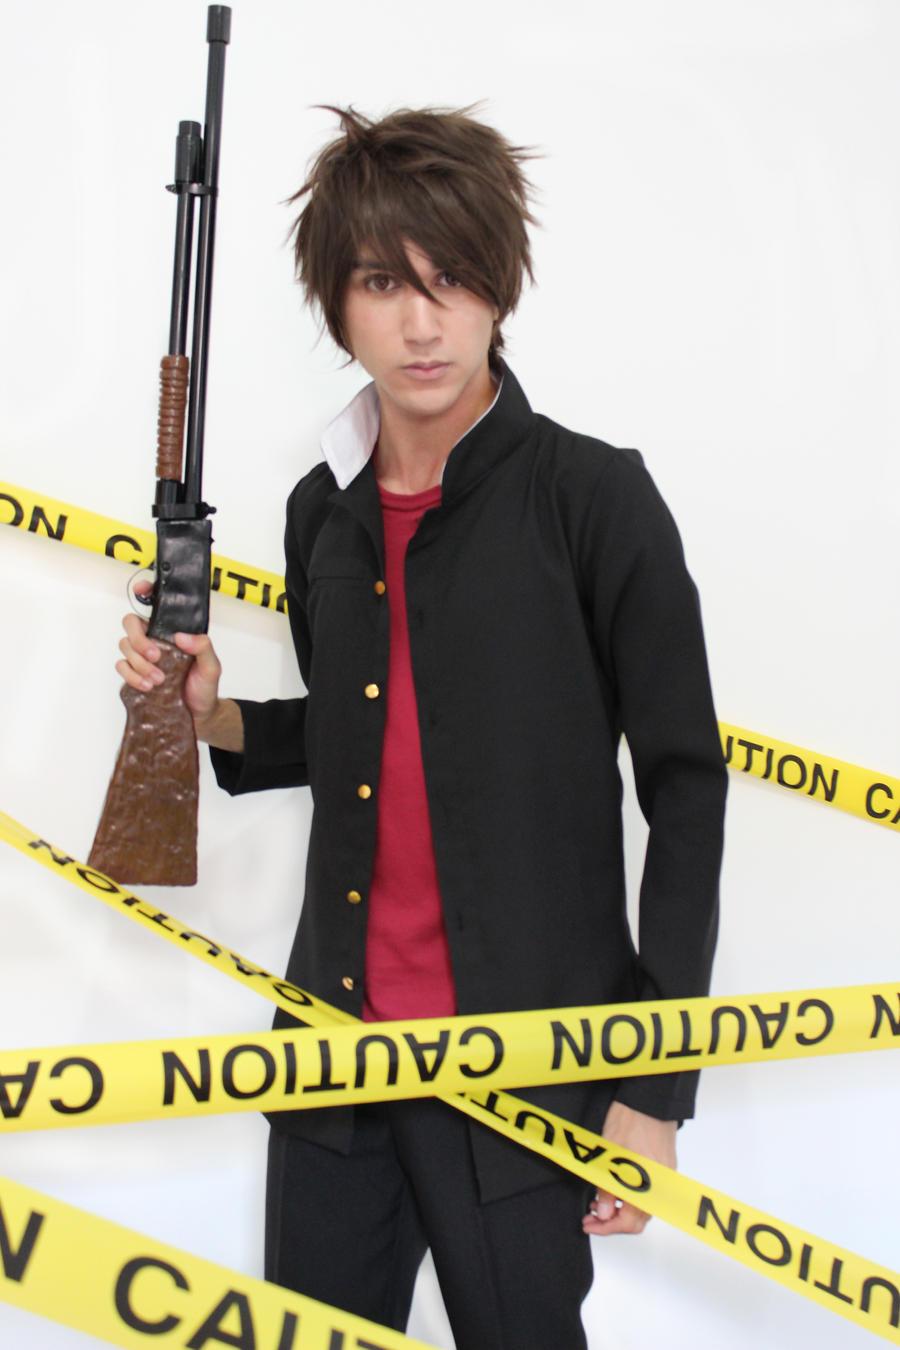 Takashi Komuro by jaacksays